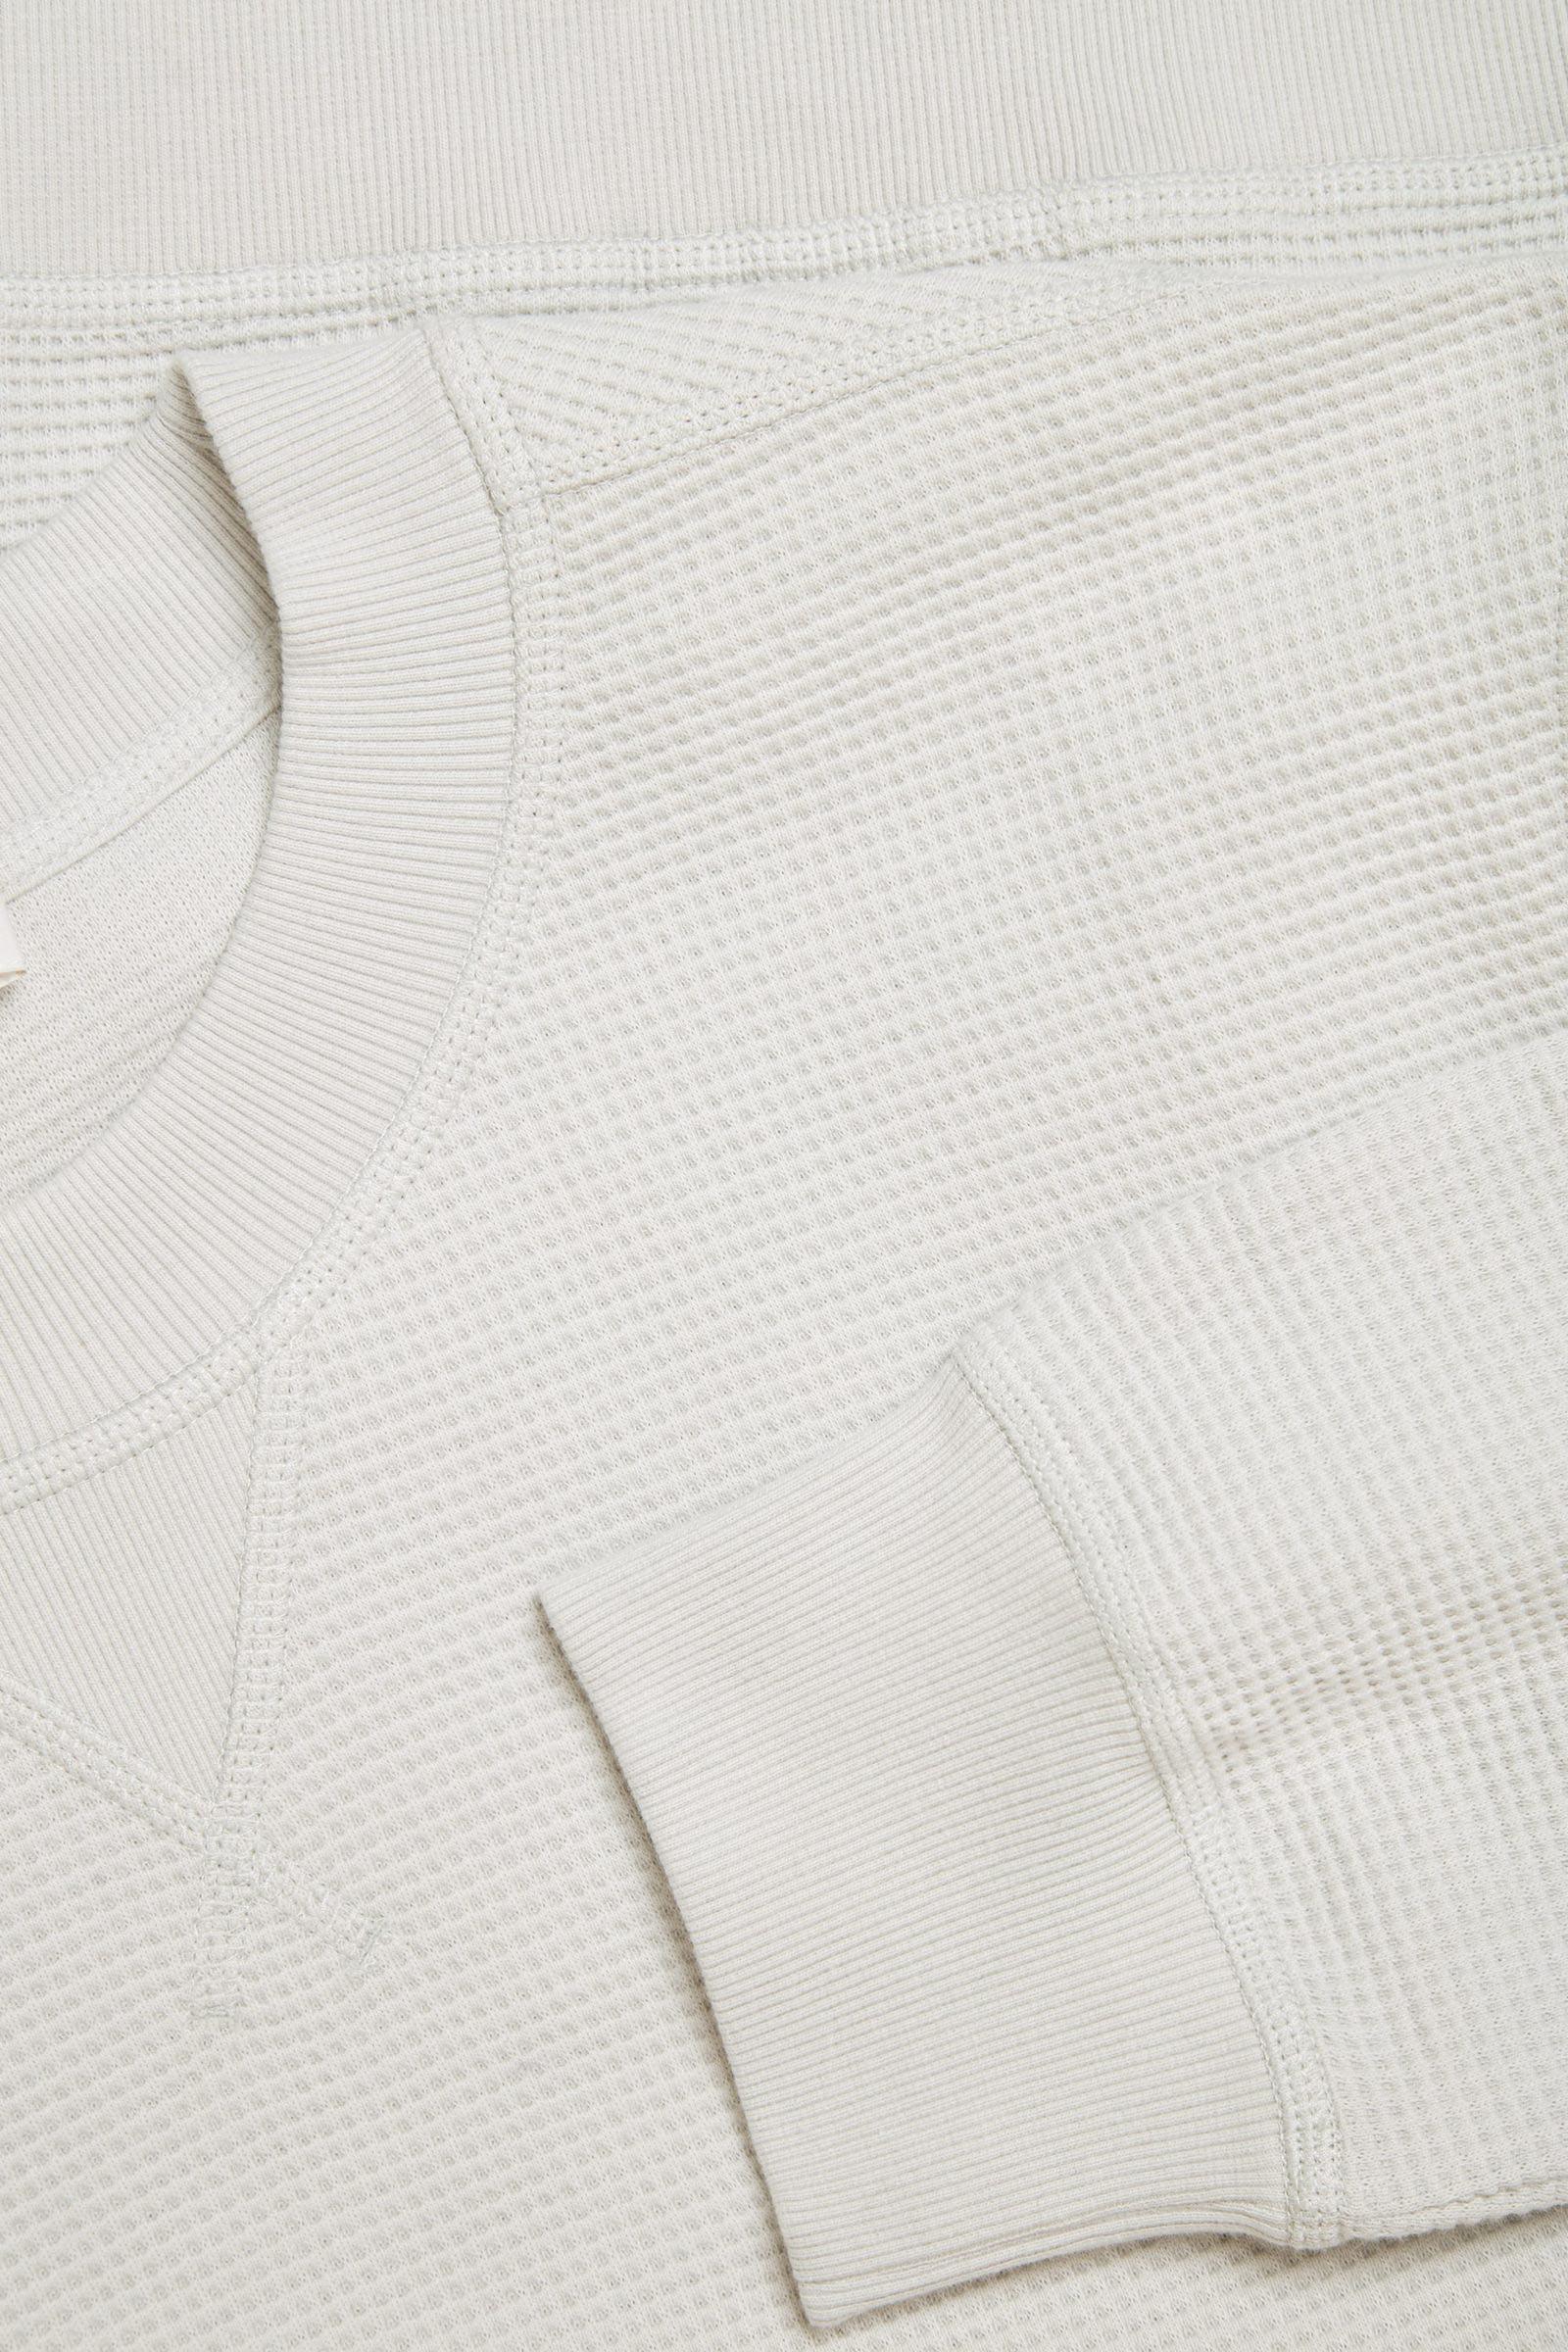 COS 와플 니트 오가닉 코튼 스웻셔츠의 몰 그레이컬러 Detail입니다.